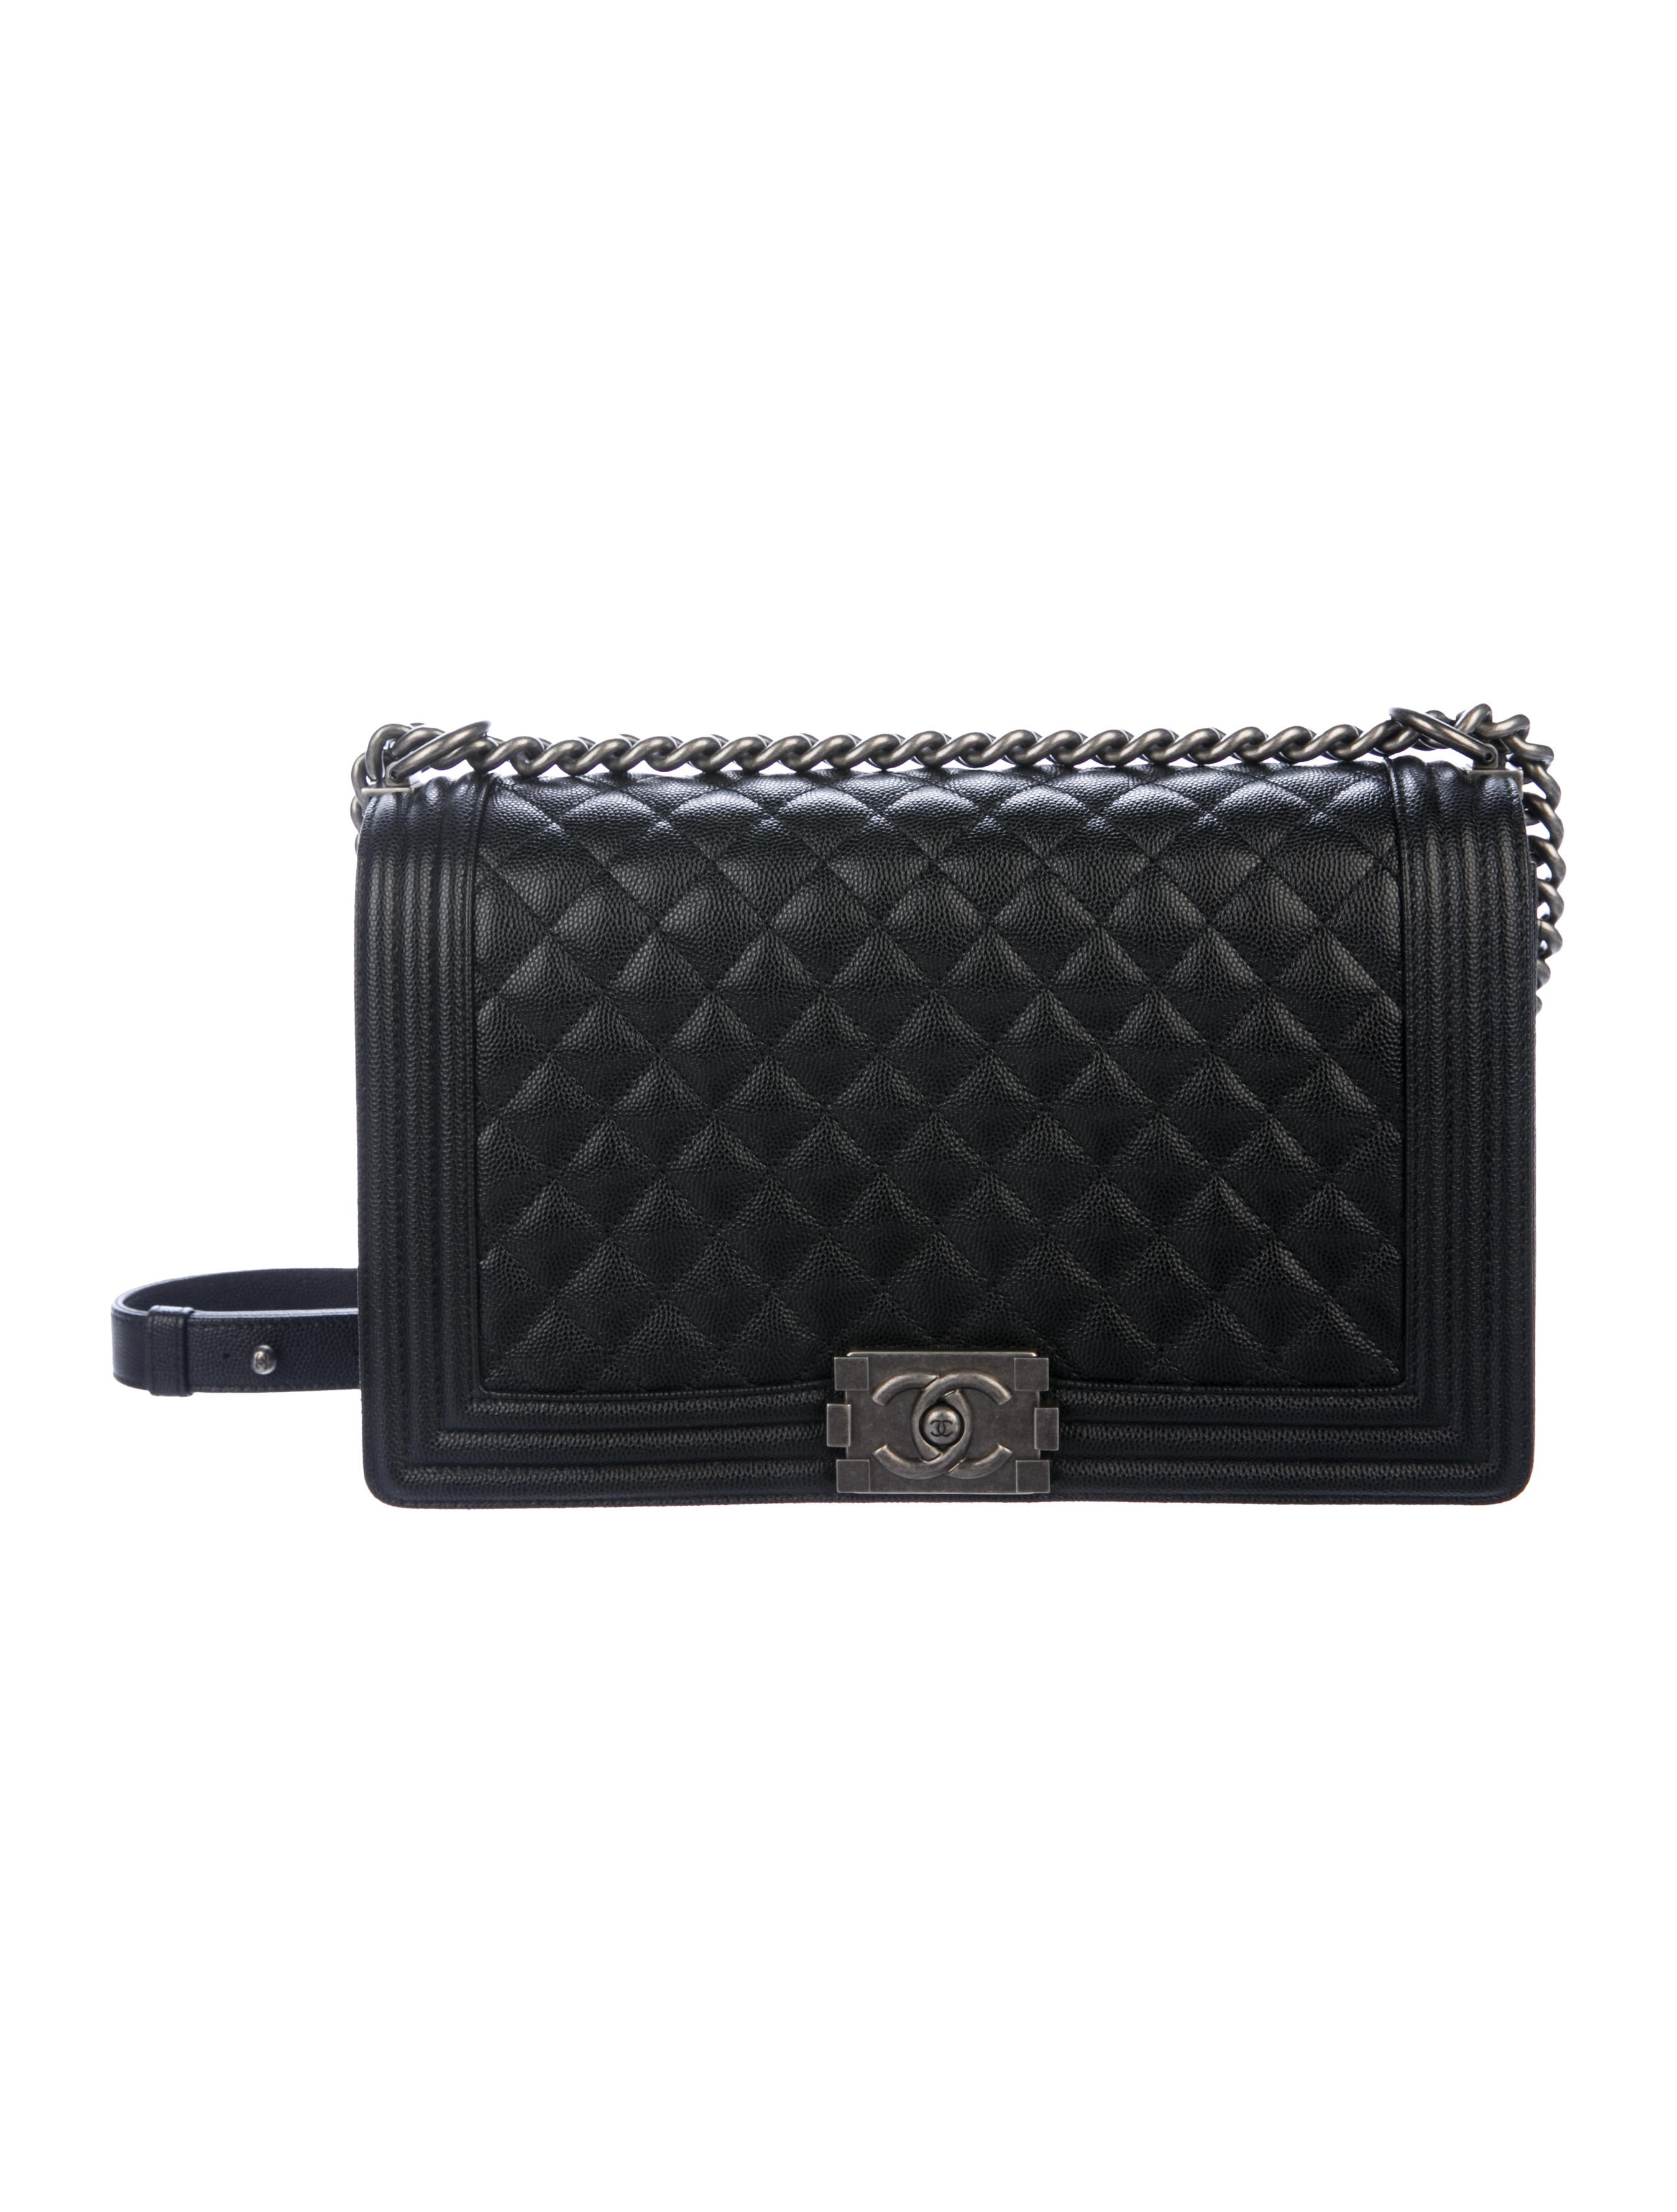 92354996b02ebe Chanel. Caviar Large Boy Bag. $4,800.00. Celine. Medium Classic Bag.  $2,900.00. Mini Multichain Square Quilt Flap ...